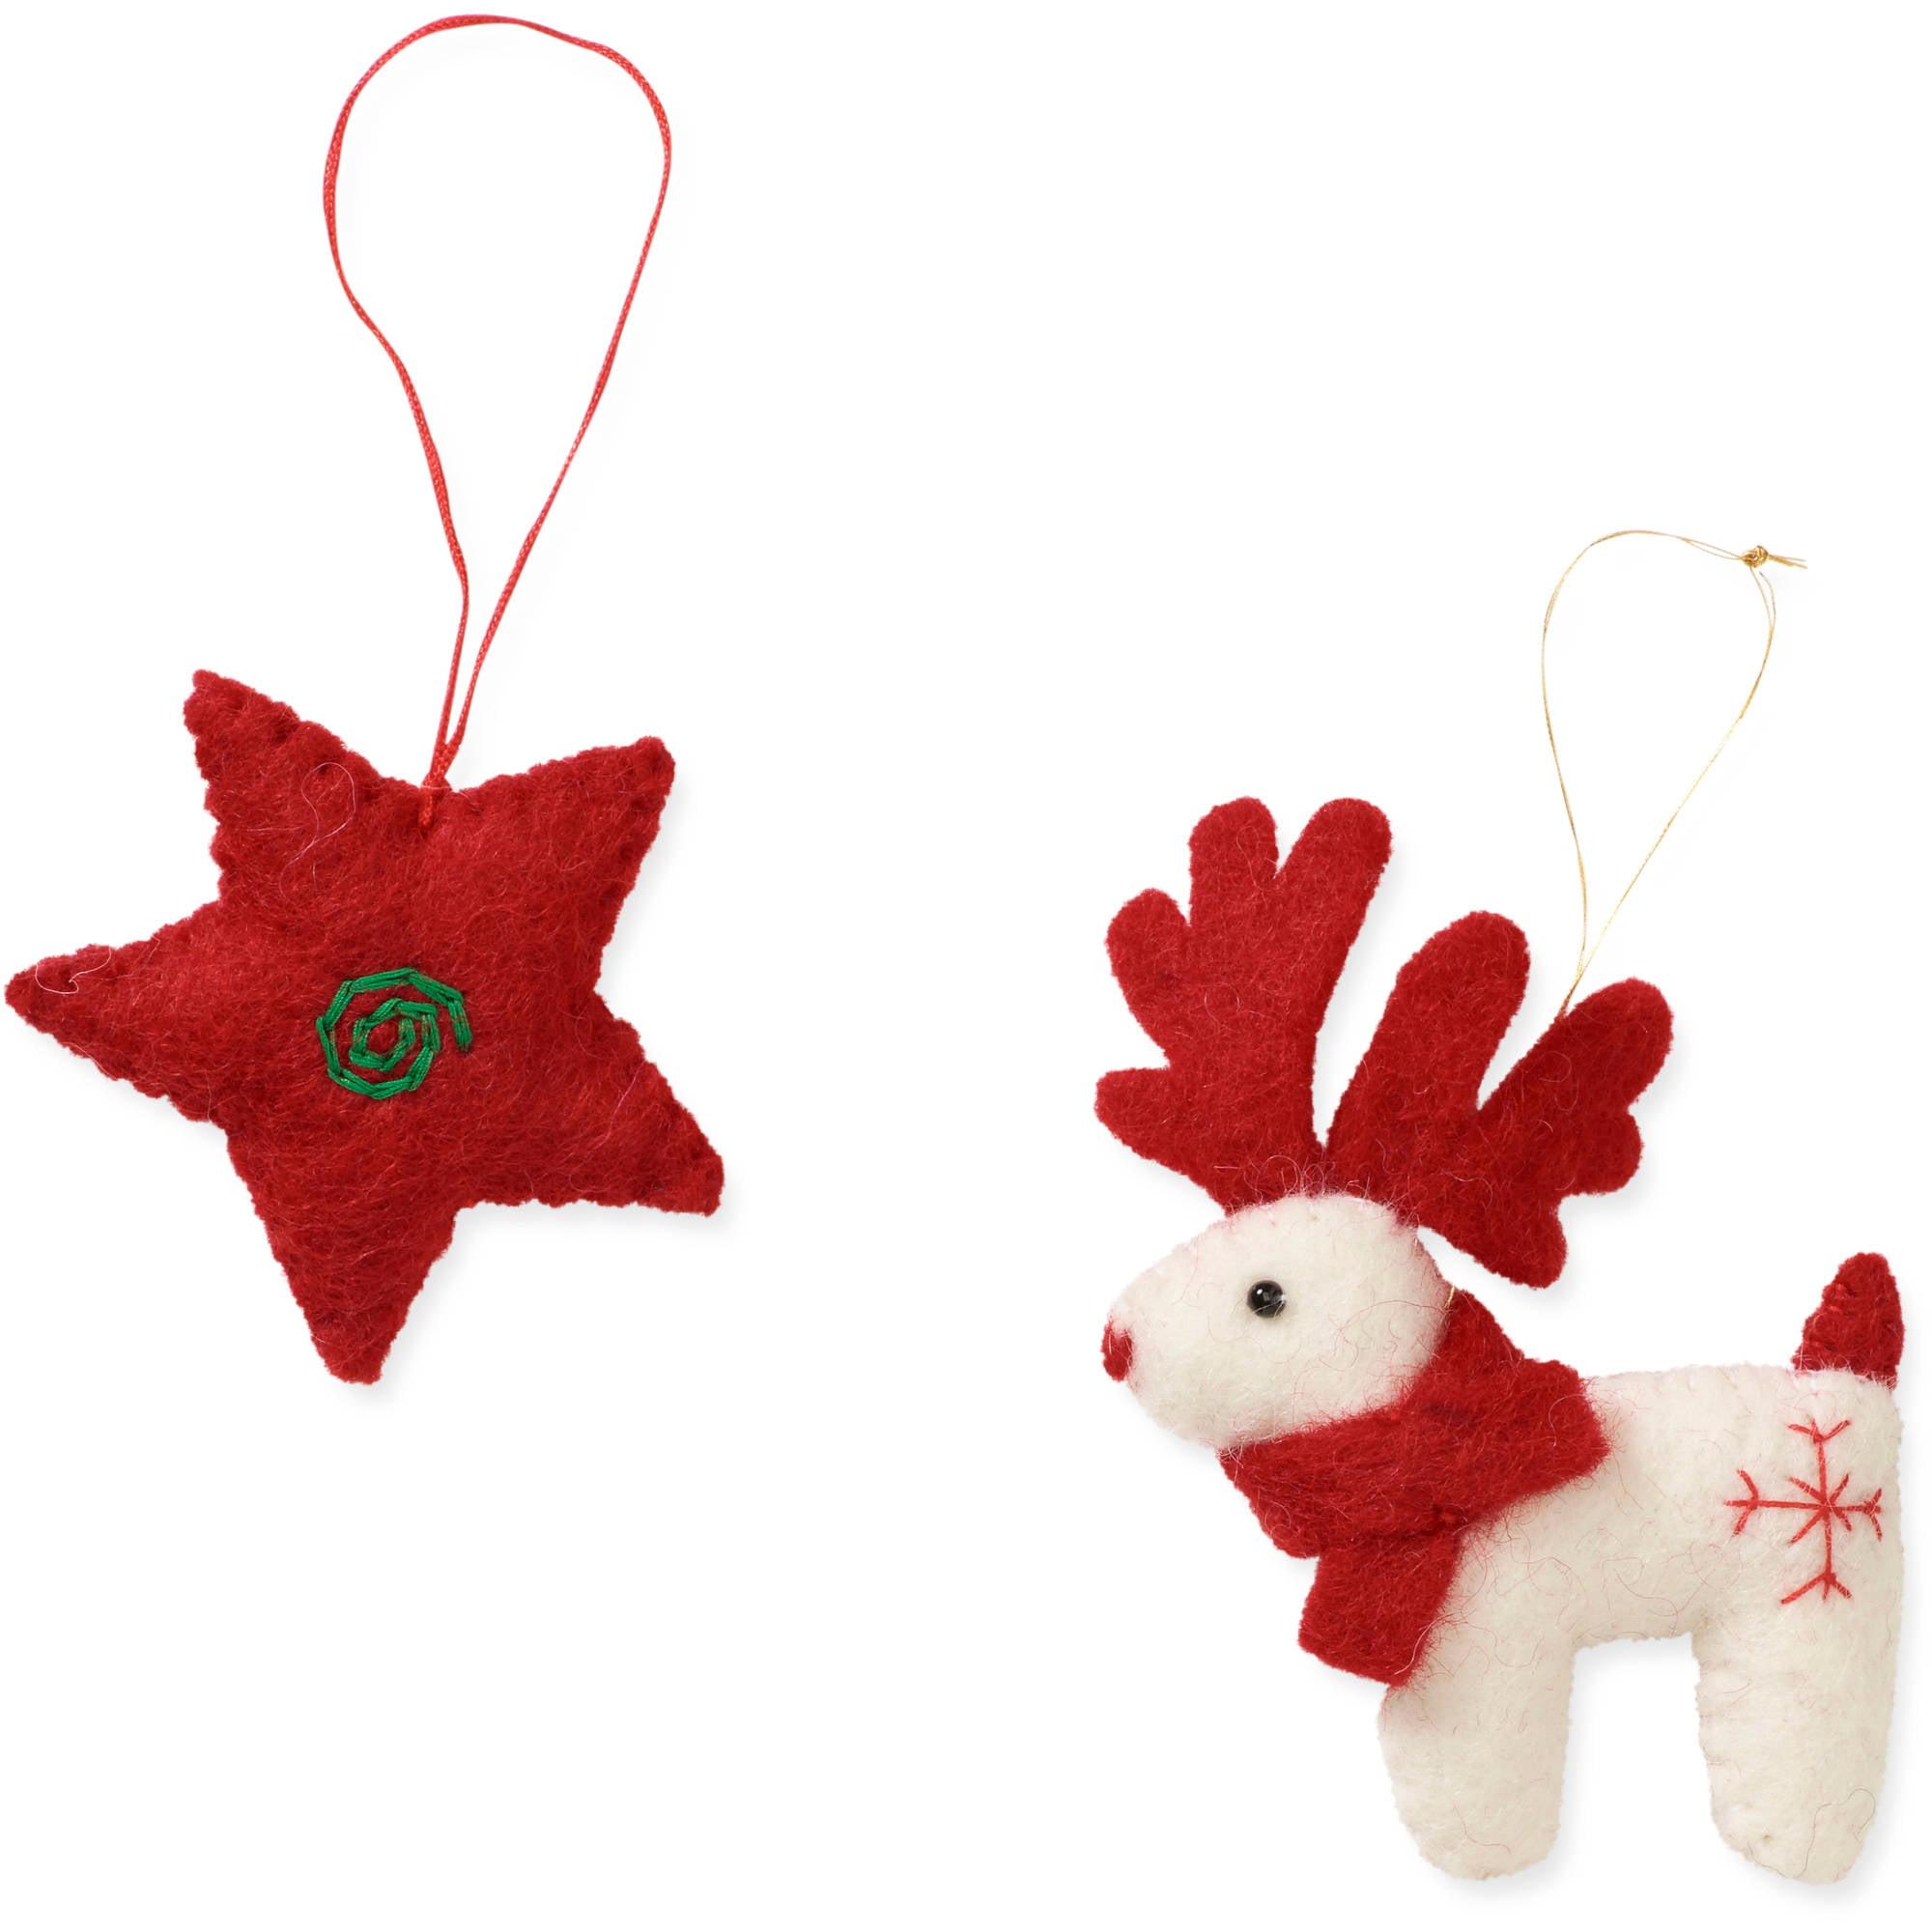 2-Piece Reindeer & Star Ornament Set by Friends Handicrafts for Global Goods Partners